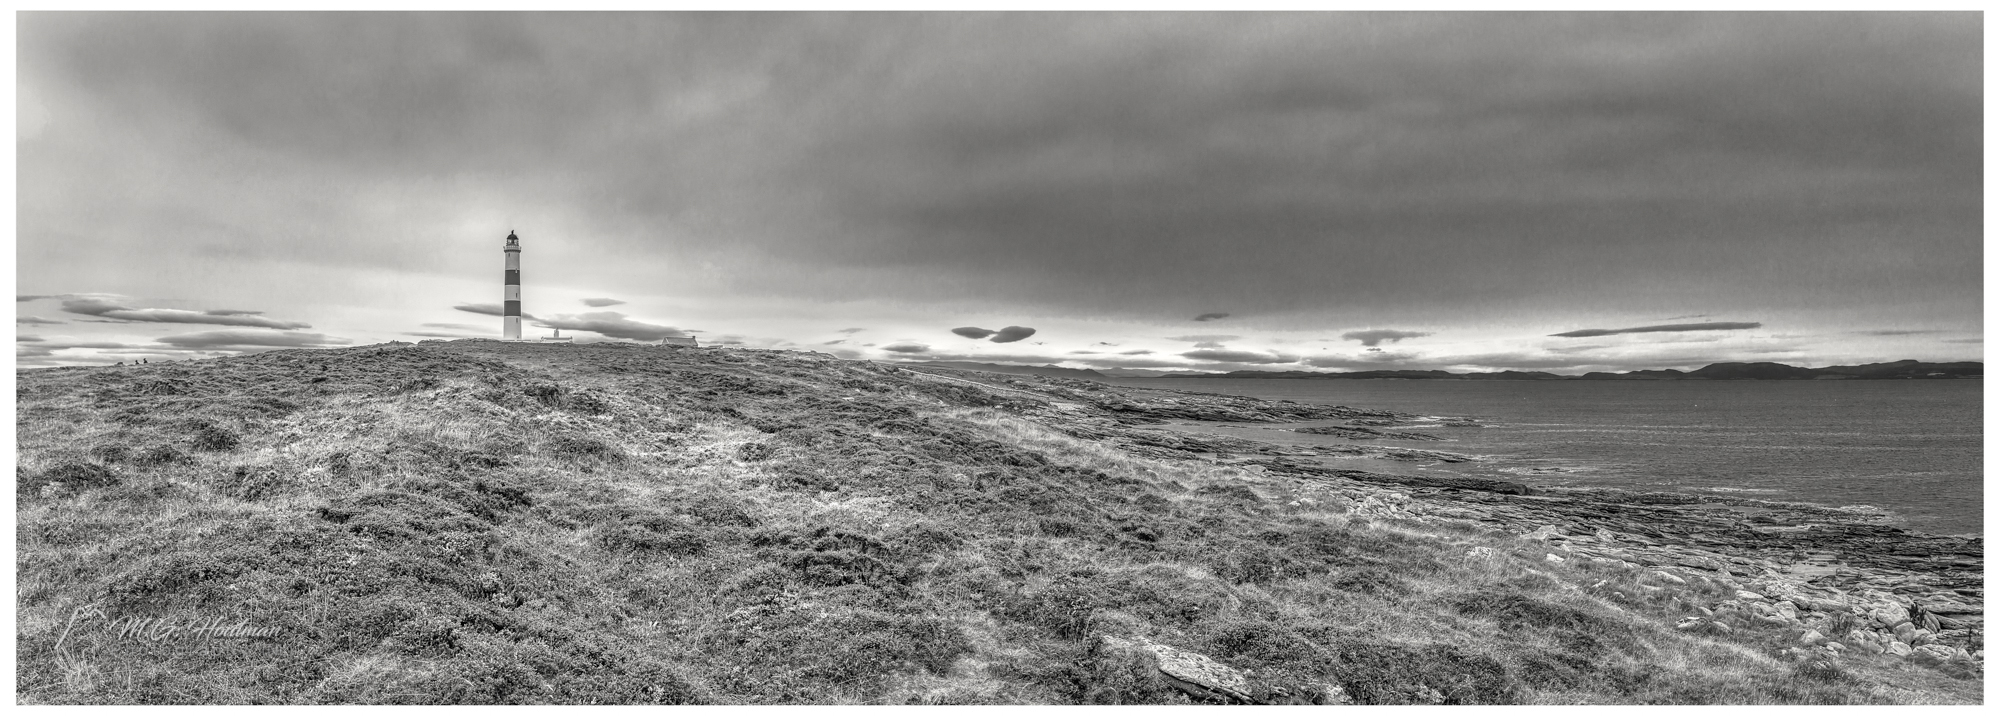 Tarbat Ness Lighthouse @ North Sea